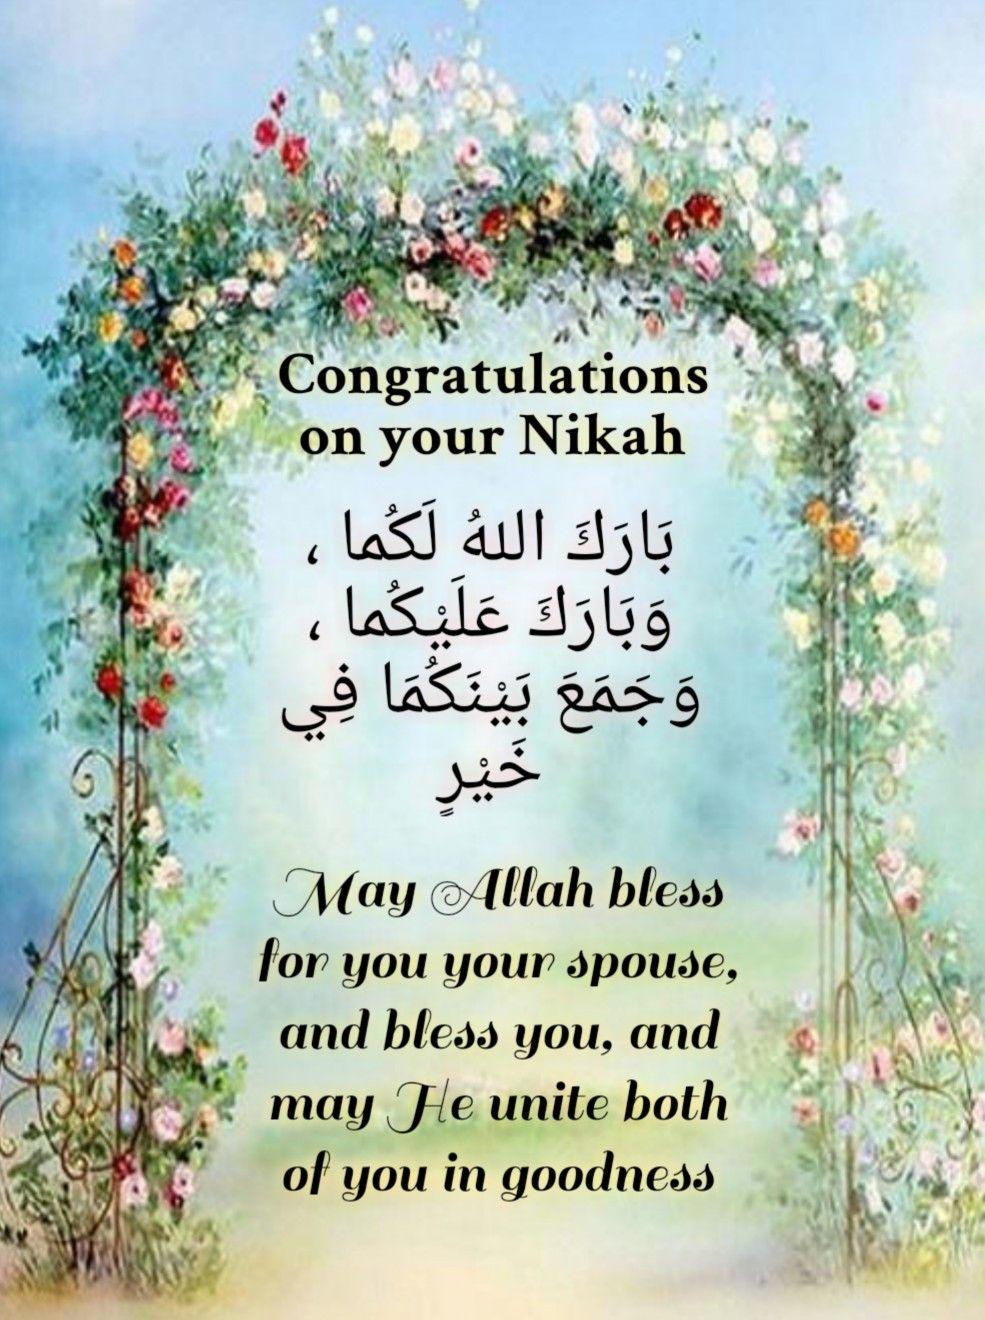 Dua for newly Wed, congratulations on nikah Islam